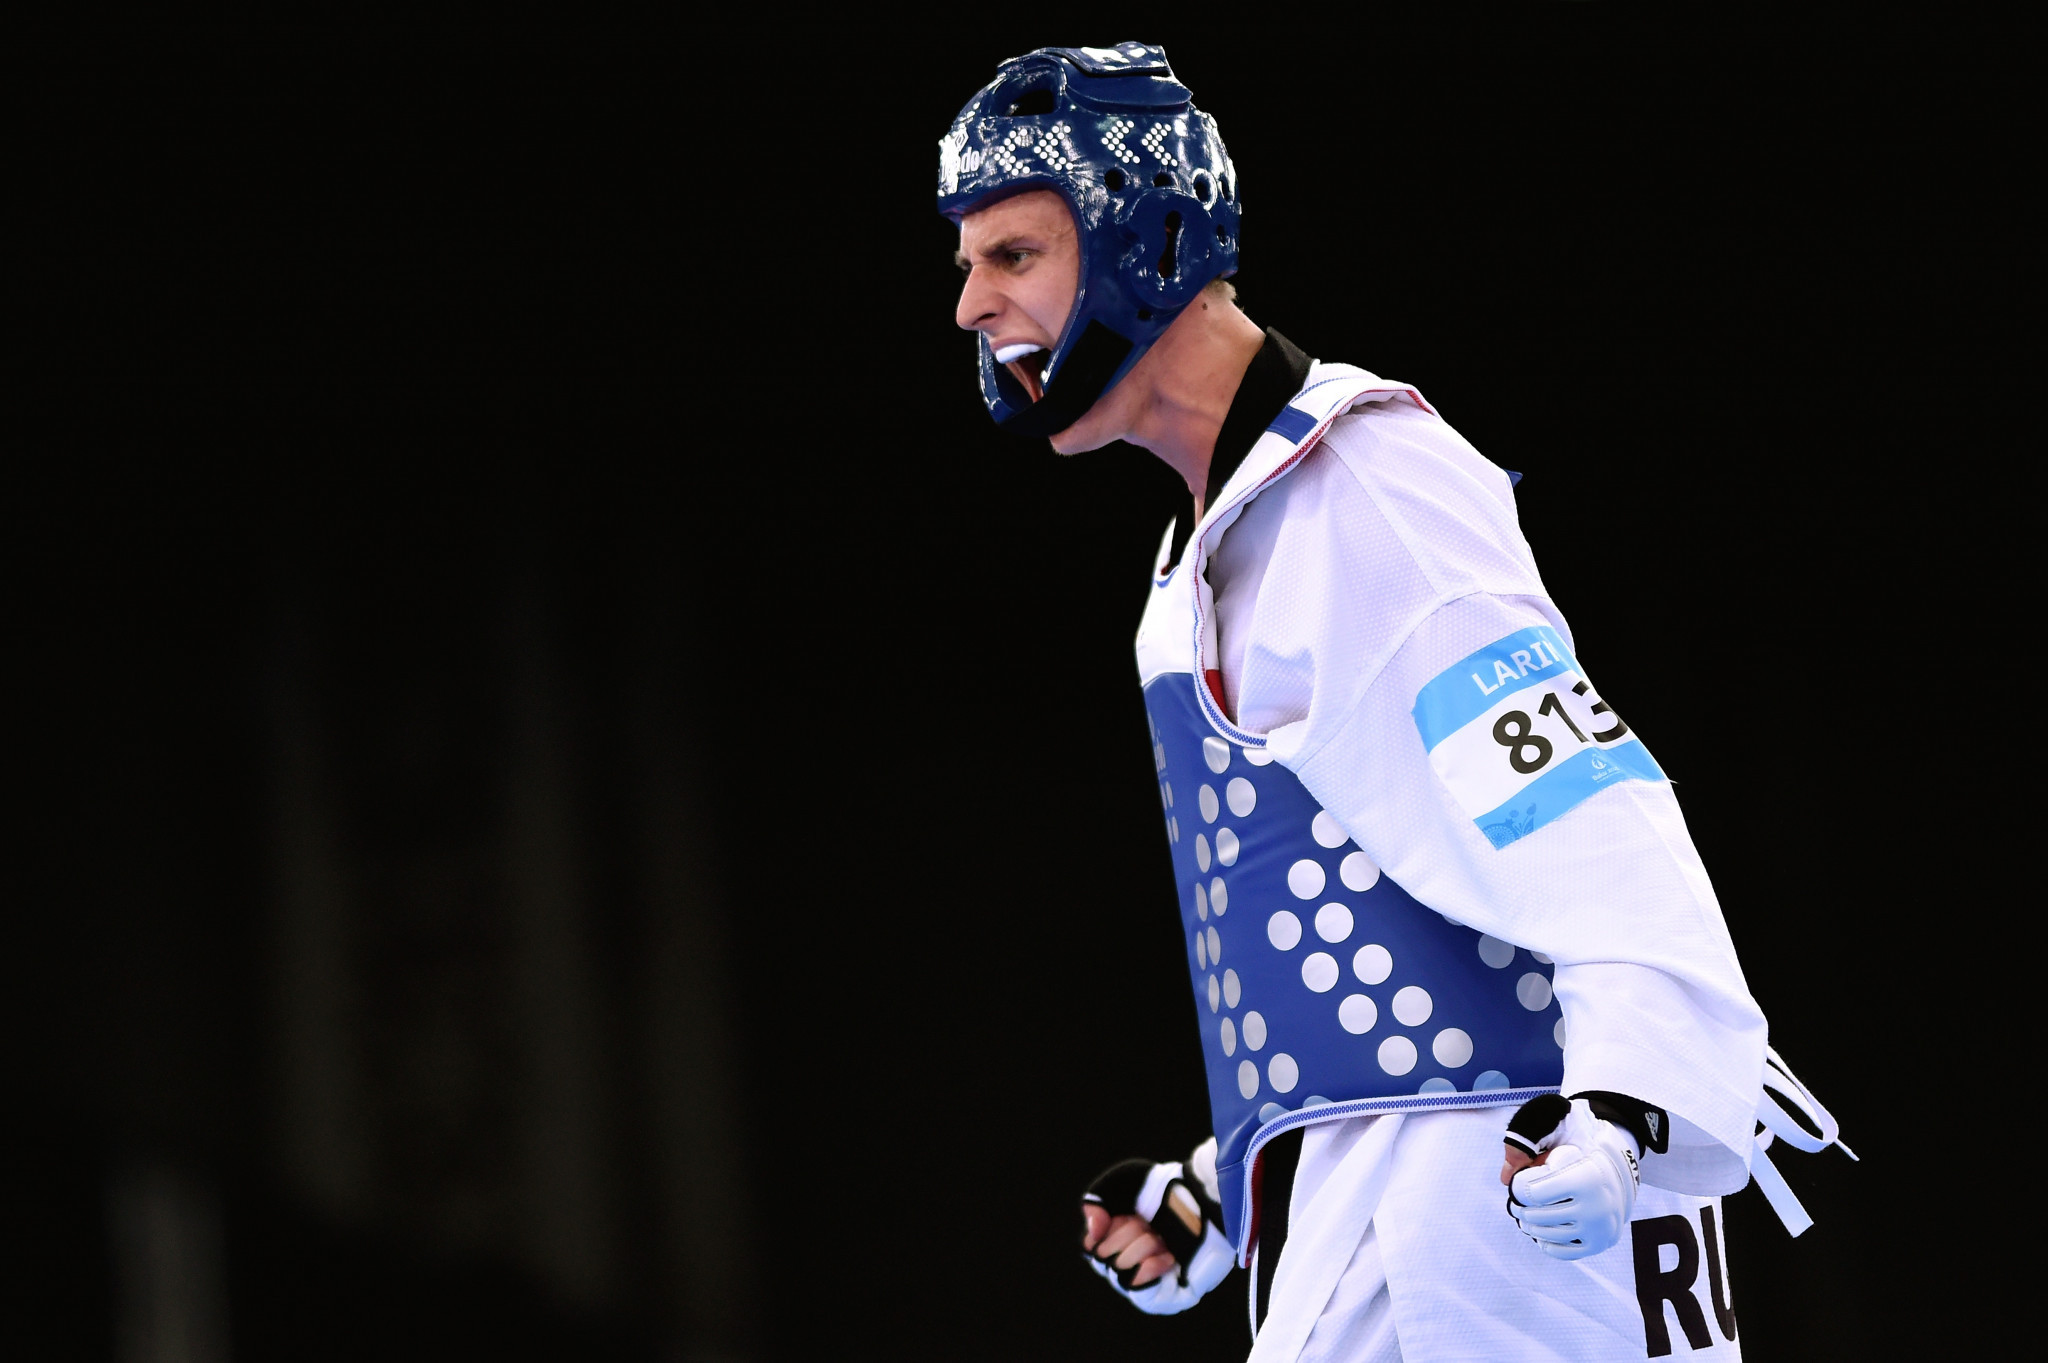 Vladislav Larin boasts a formidable taekwondo record ©Getty Images